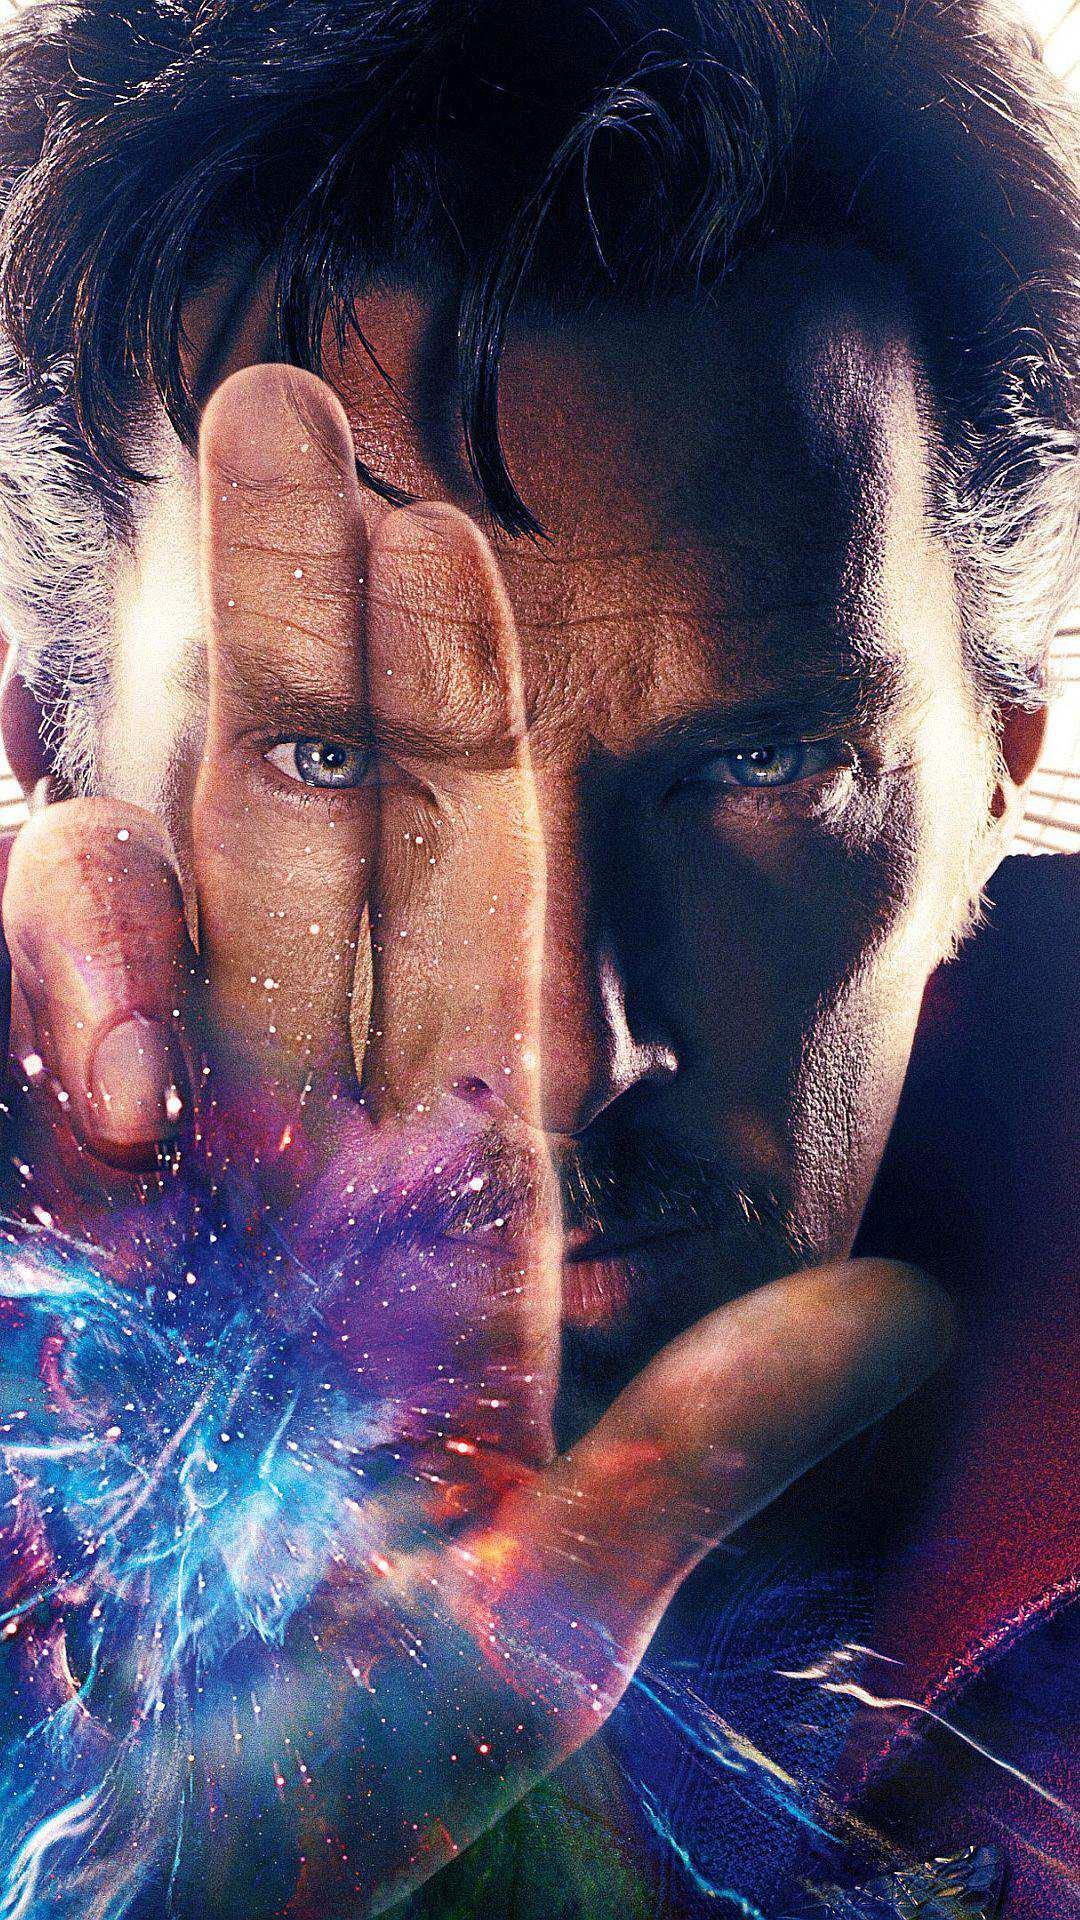 Tony Stark Hd Wallpapers Doctor Strange Illusion Artwork Iphone Wallpaper Iphone